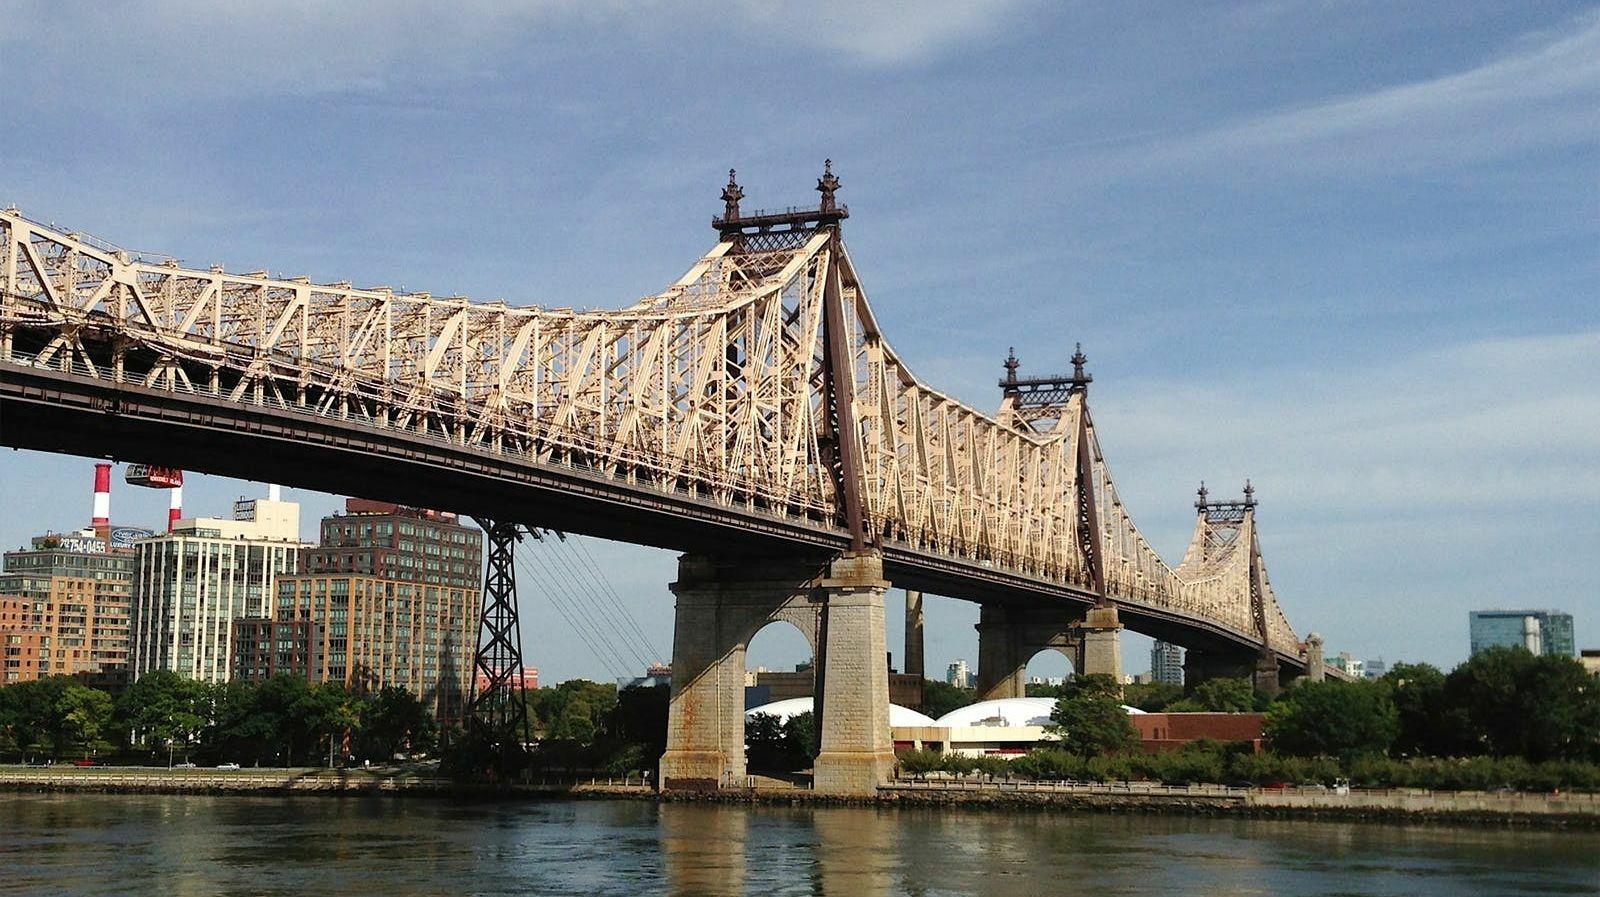 TCM Classic Film tour @ New York City locations